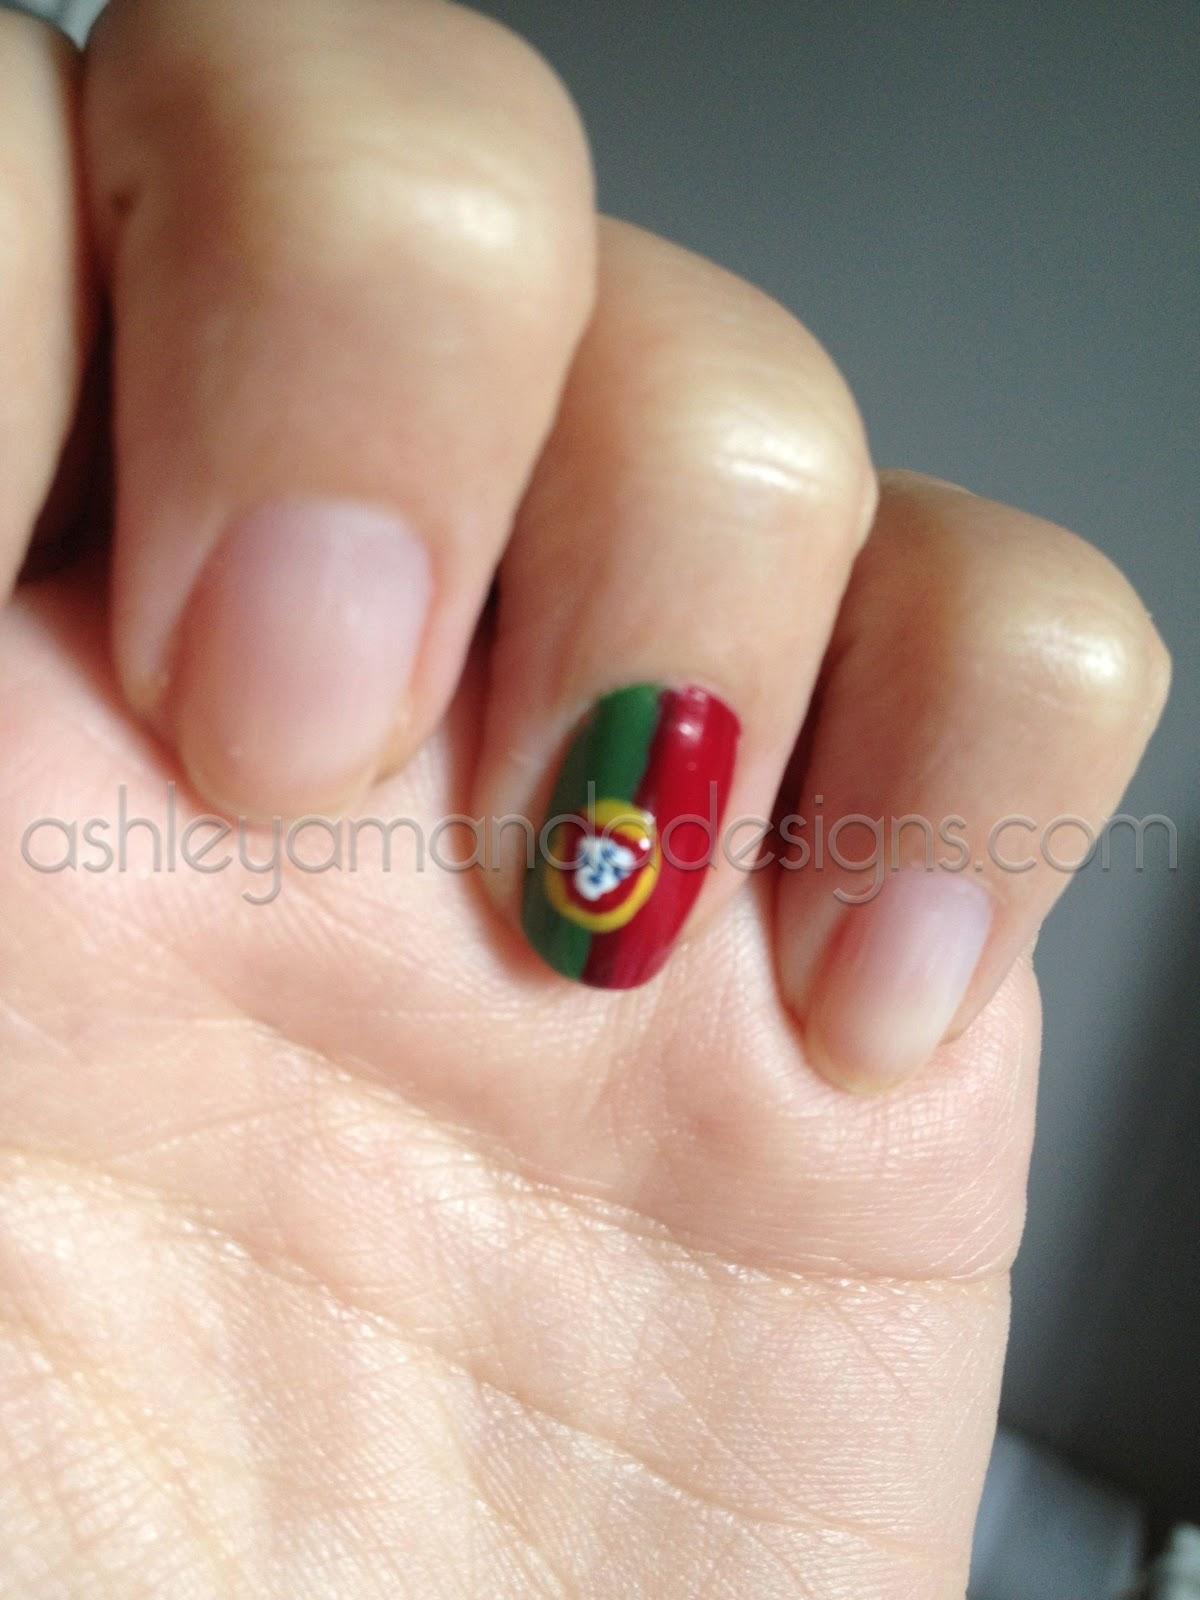 Ashley Amanda: Portuguese Flag Nail Art